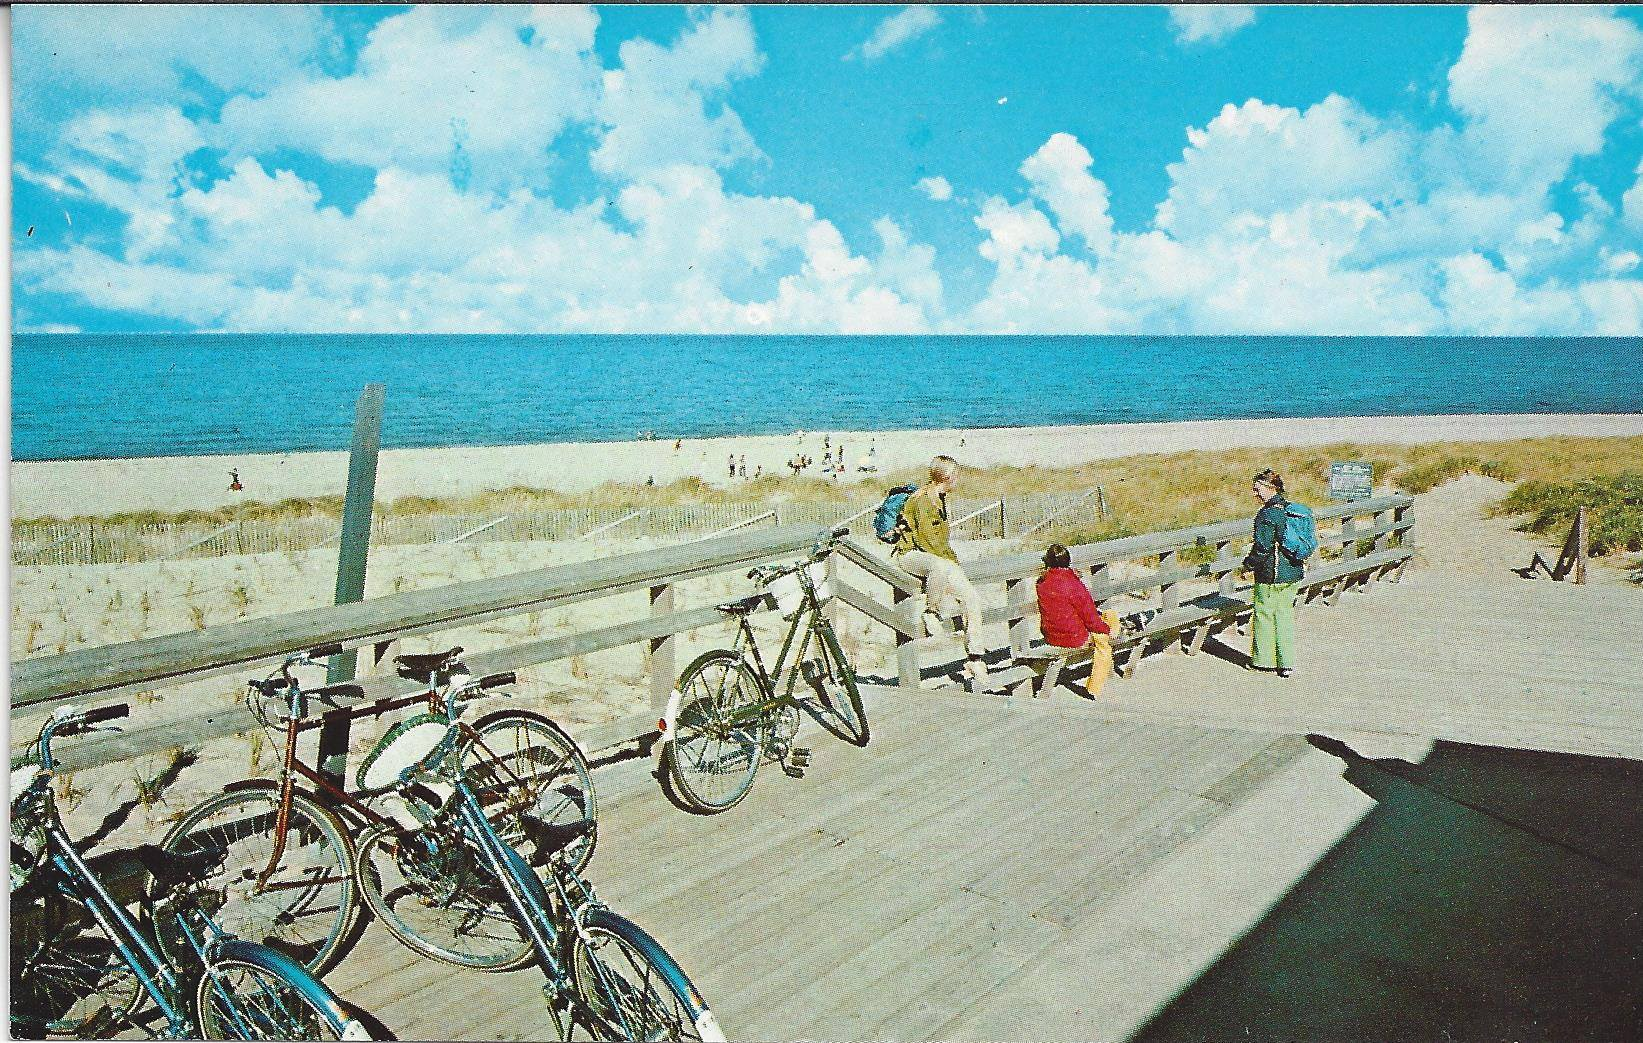 Nelson's rental bikes at New Beach c 1970 - Salvador Vasques